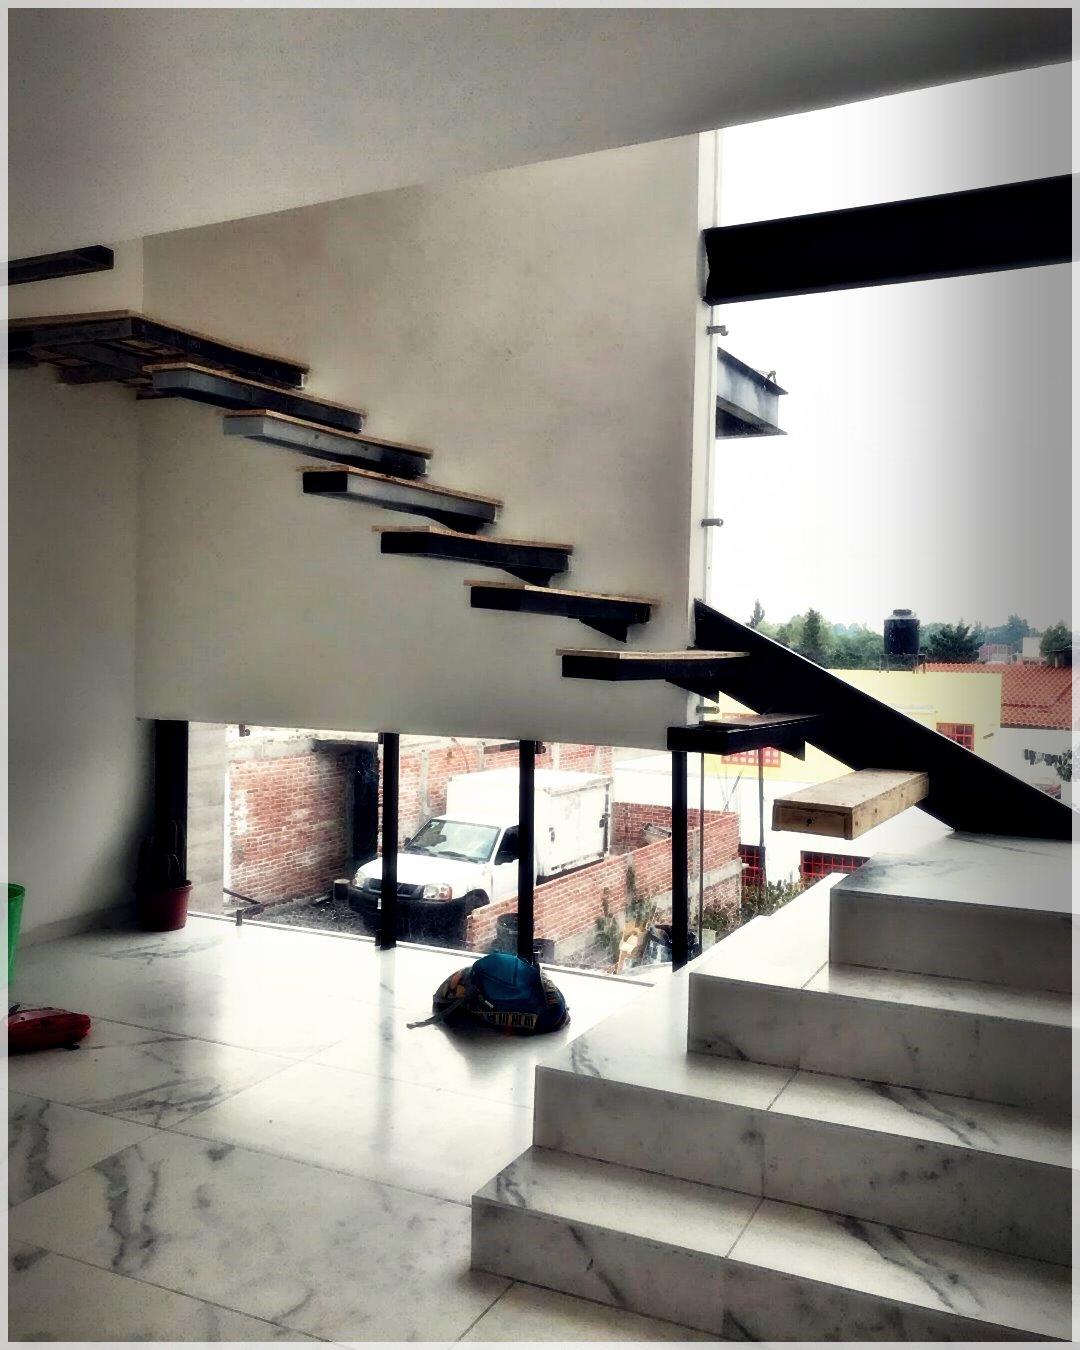 ModernHouse-81686251710